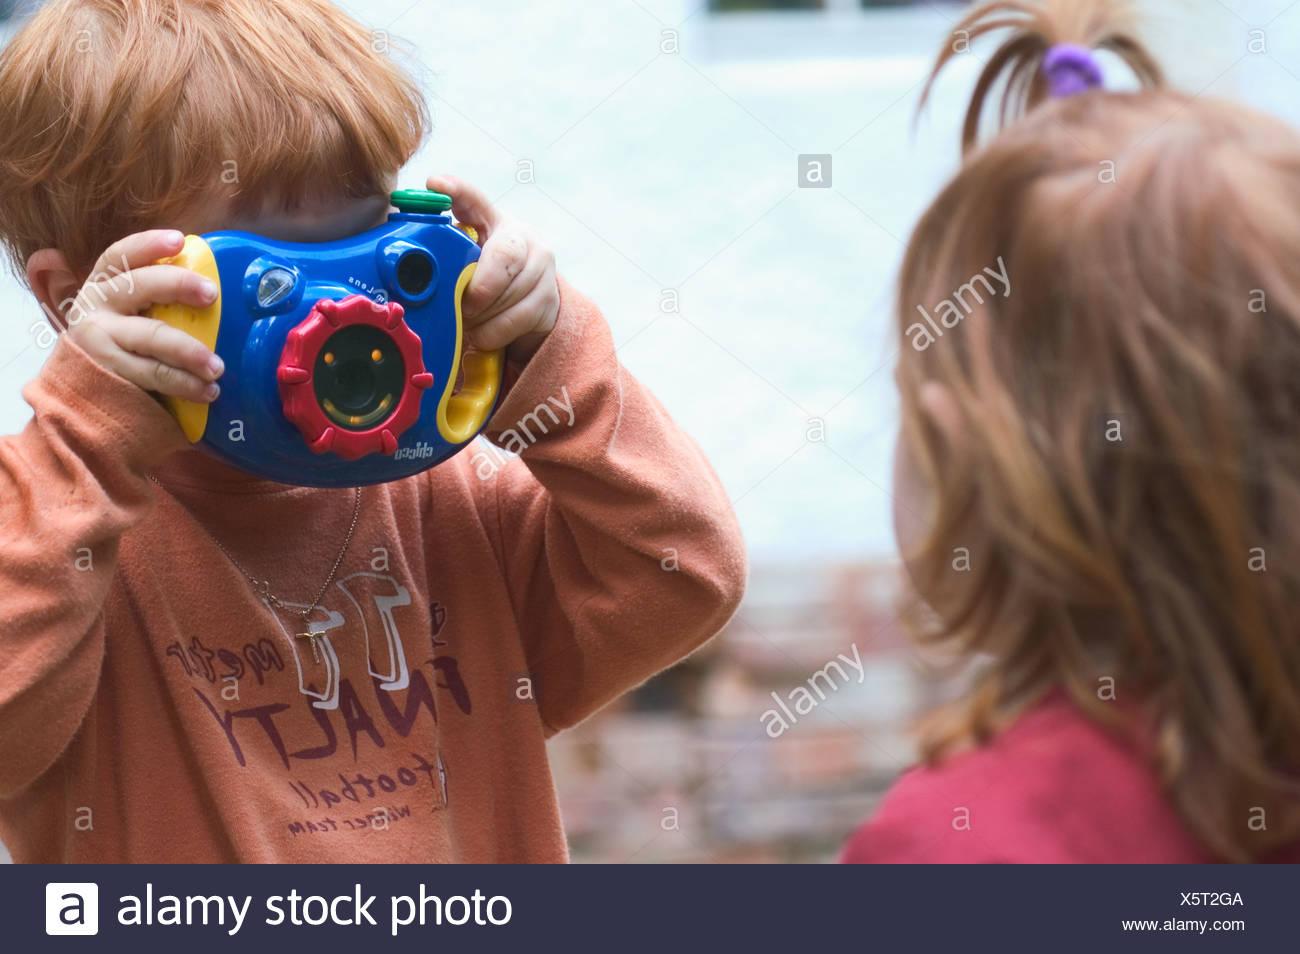 MR Kind beim fotografieren MR child taking pictures photos - Stock Image